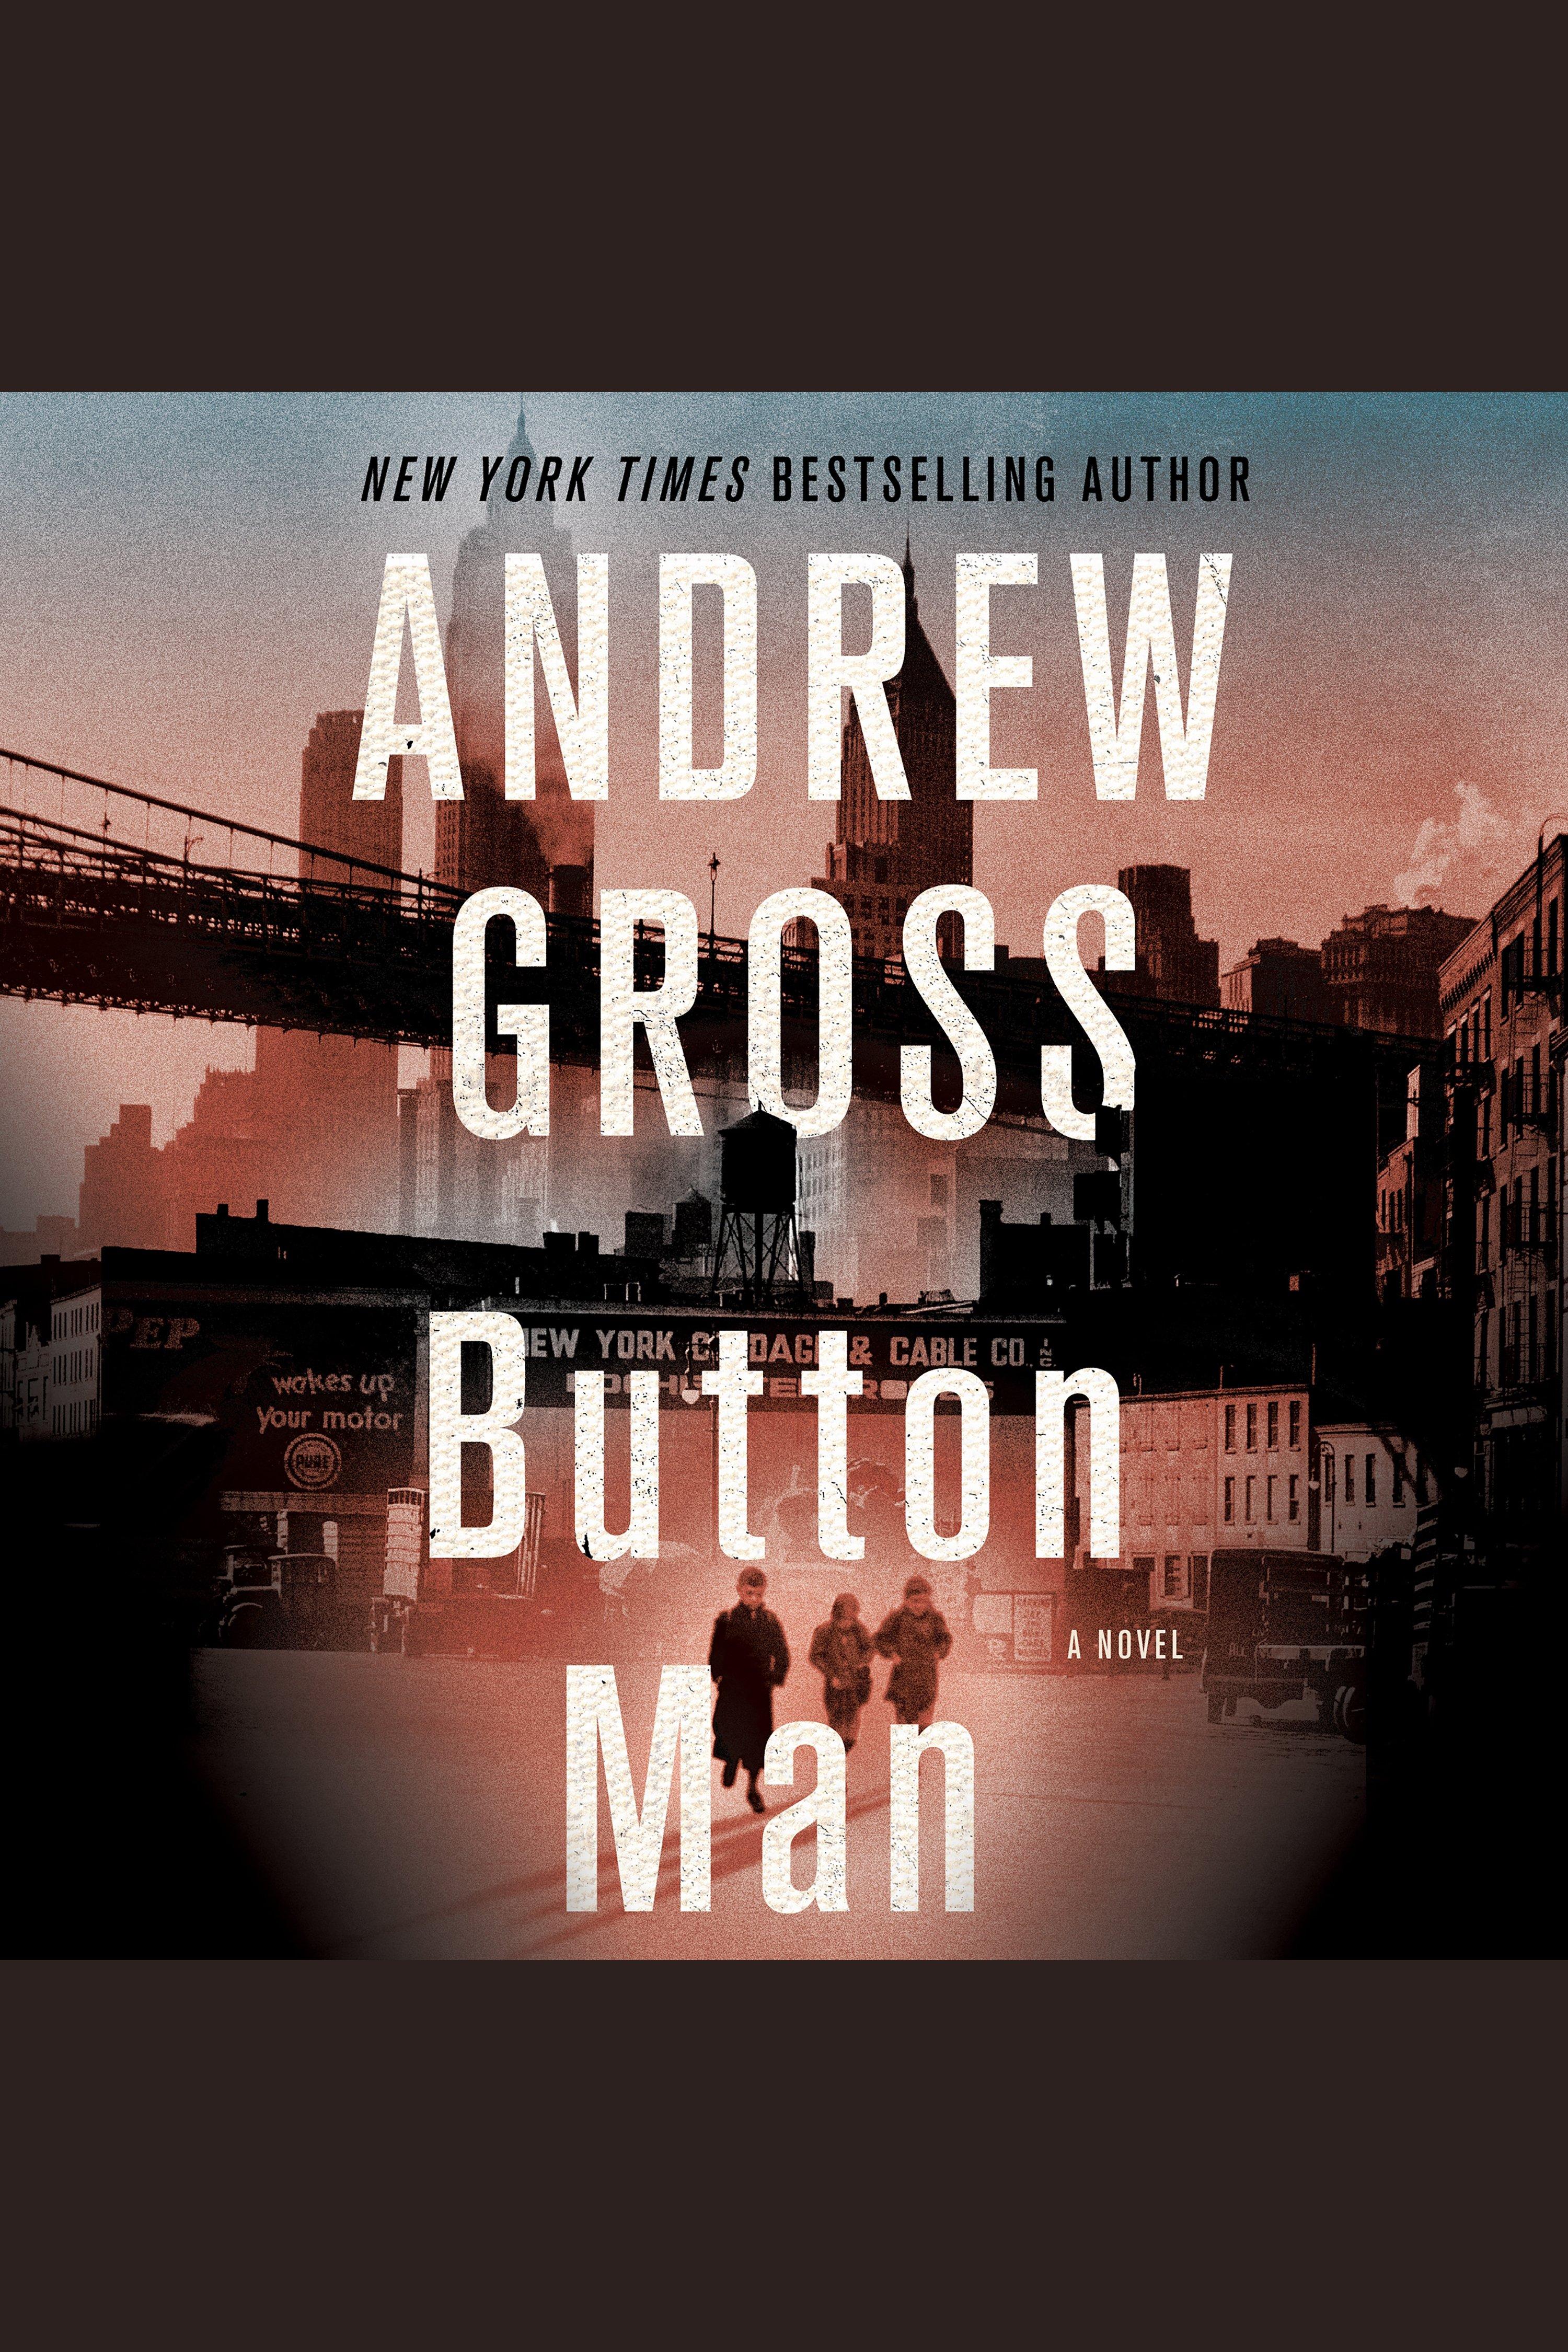 Button Man [electronic resource] : A Novel